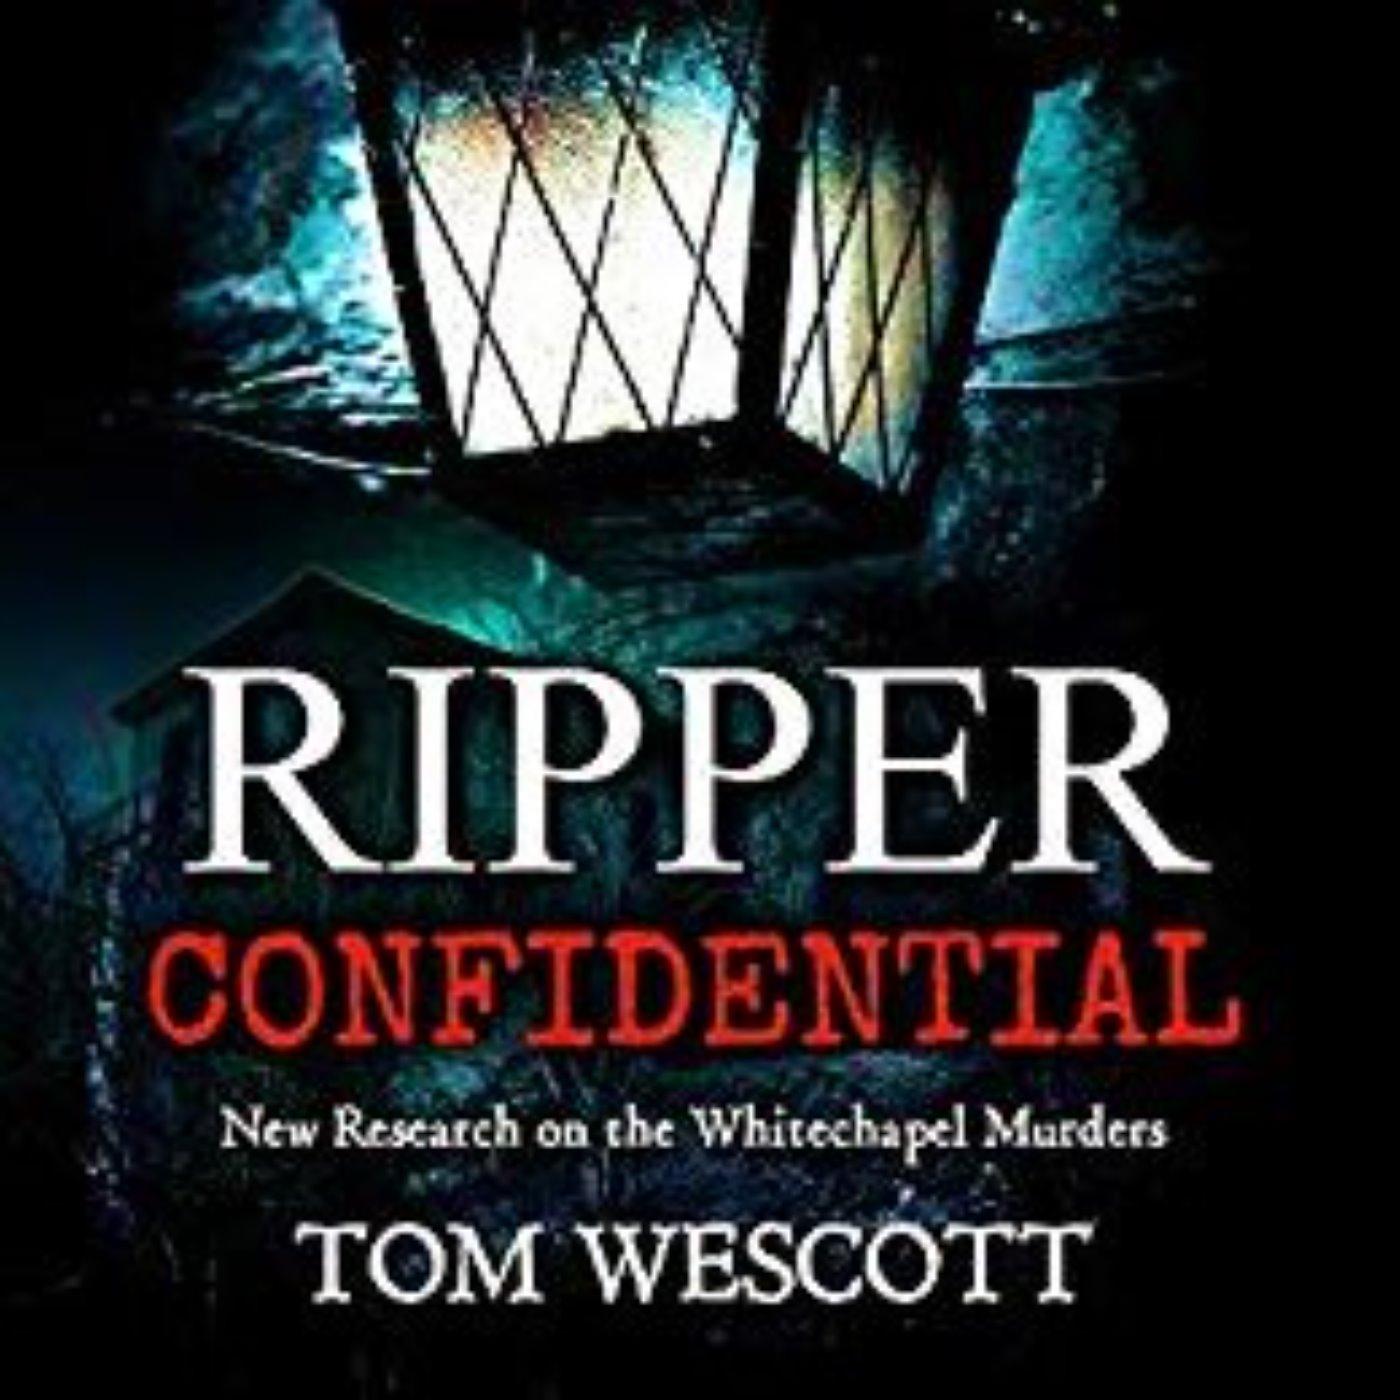 TOM WESCOTT - RIPPER CONFIDENTIAL